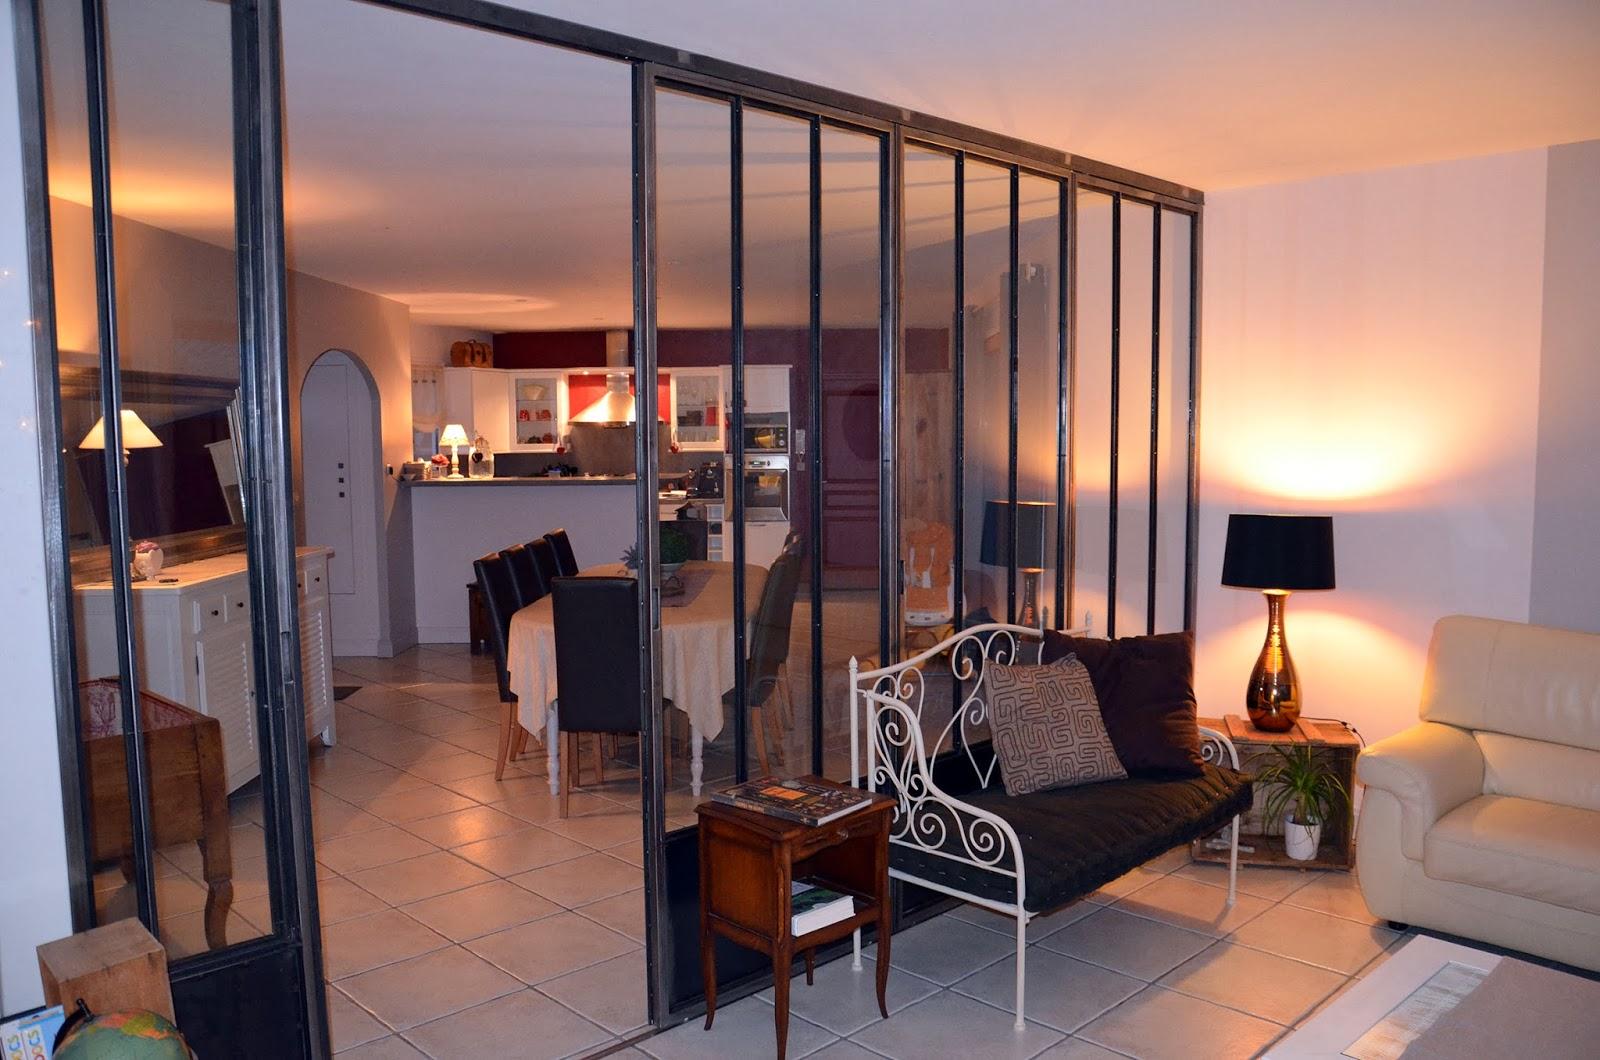 leroy merlin cloison amovible cloison separation de piece poitiers design cloisons leroy merlin. Black Bedroom Furniture Sets. Home Design Ideas